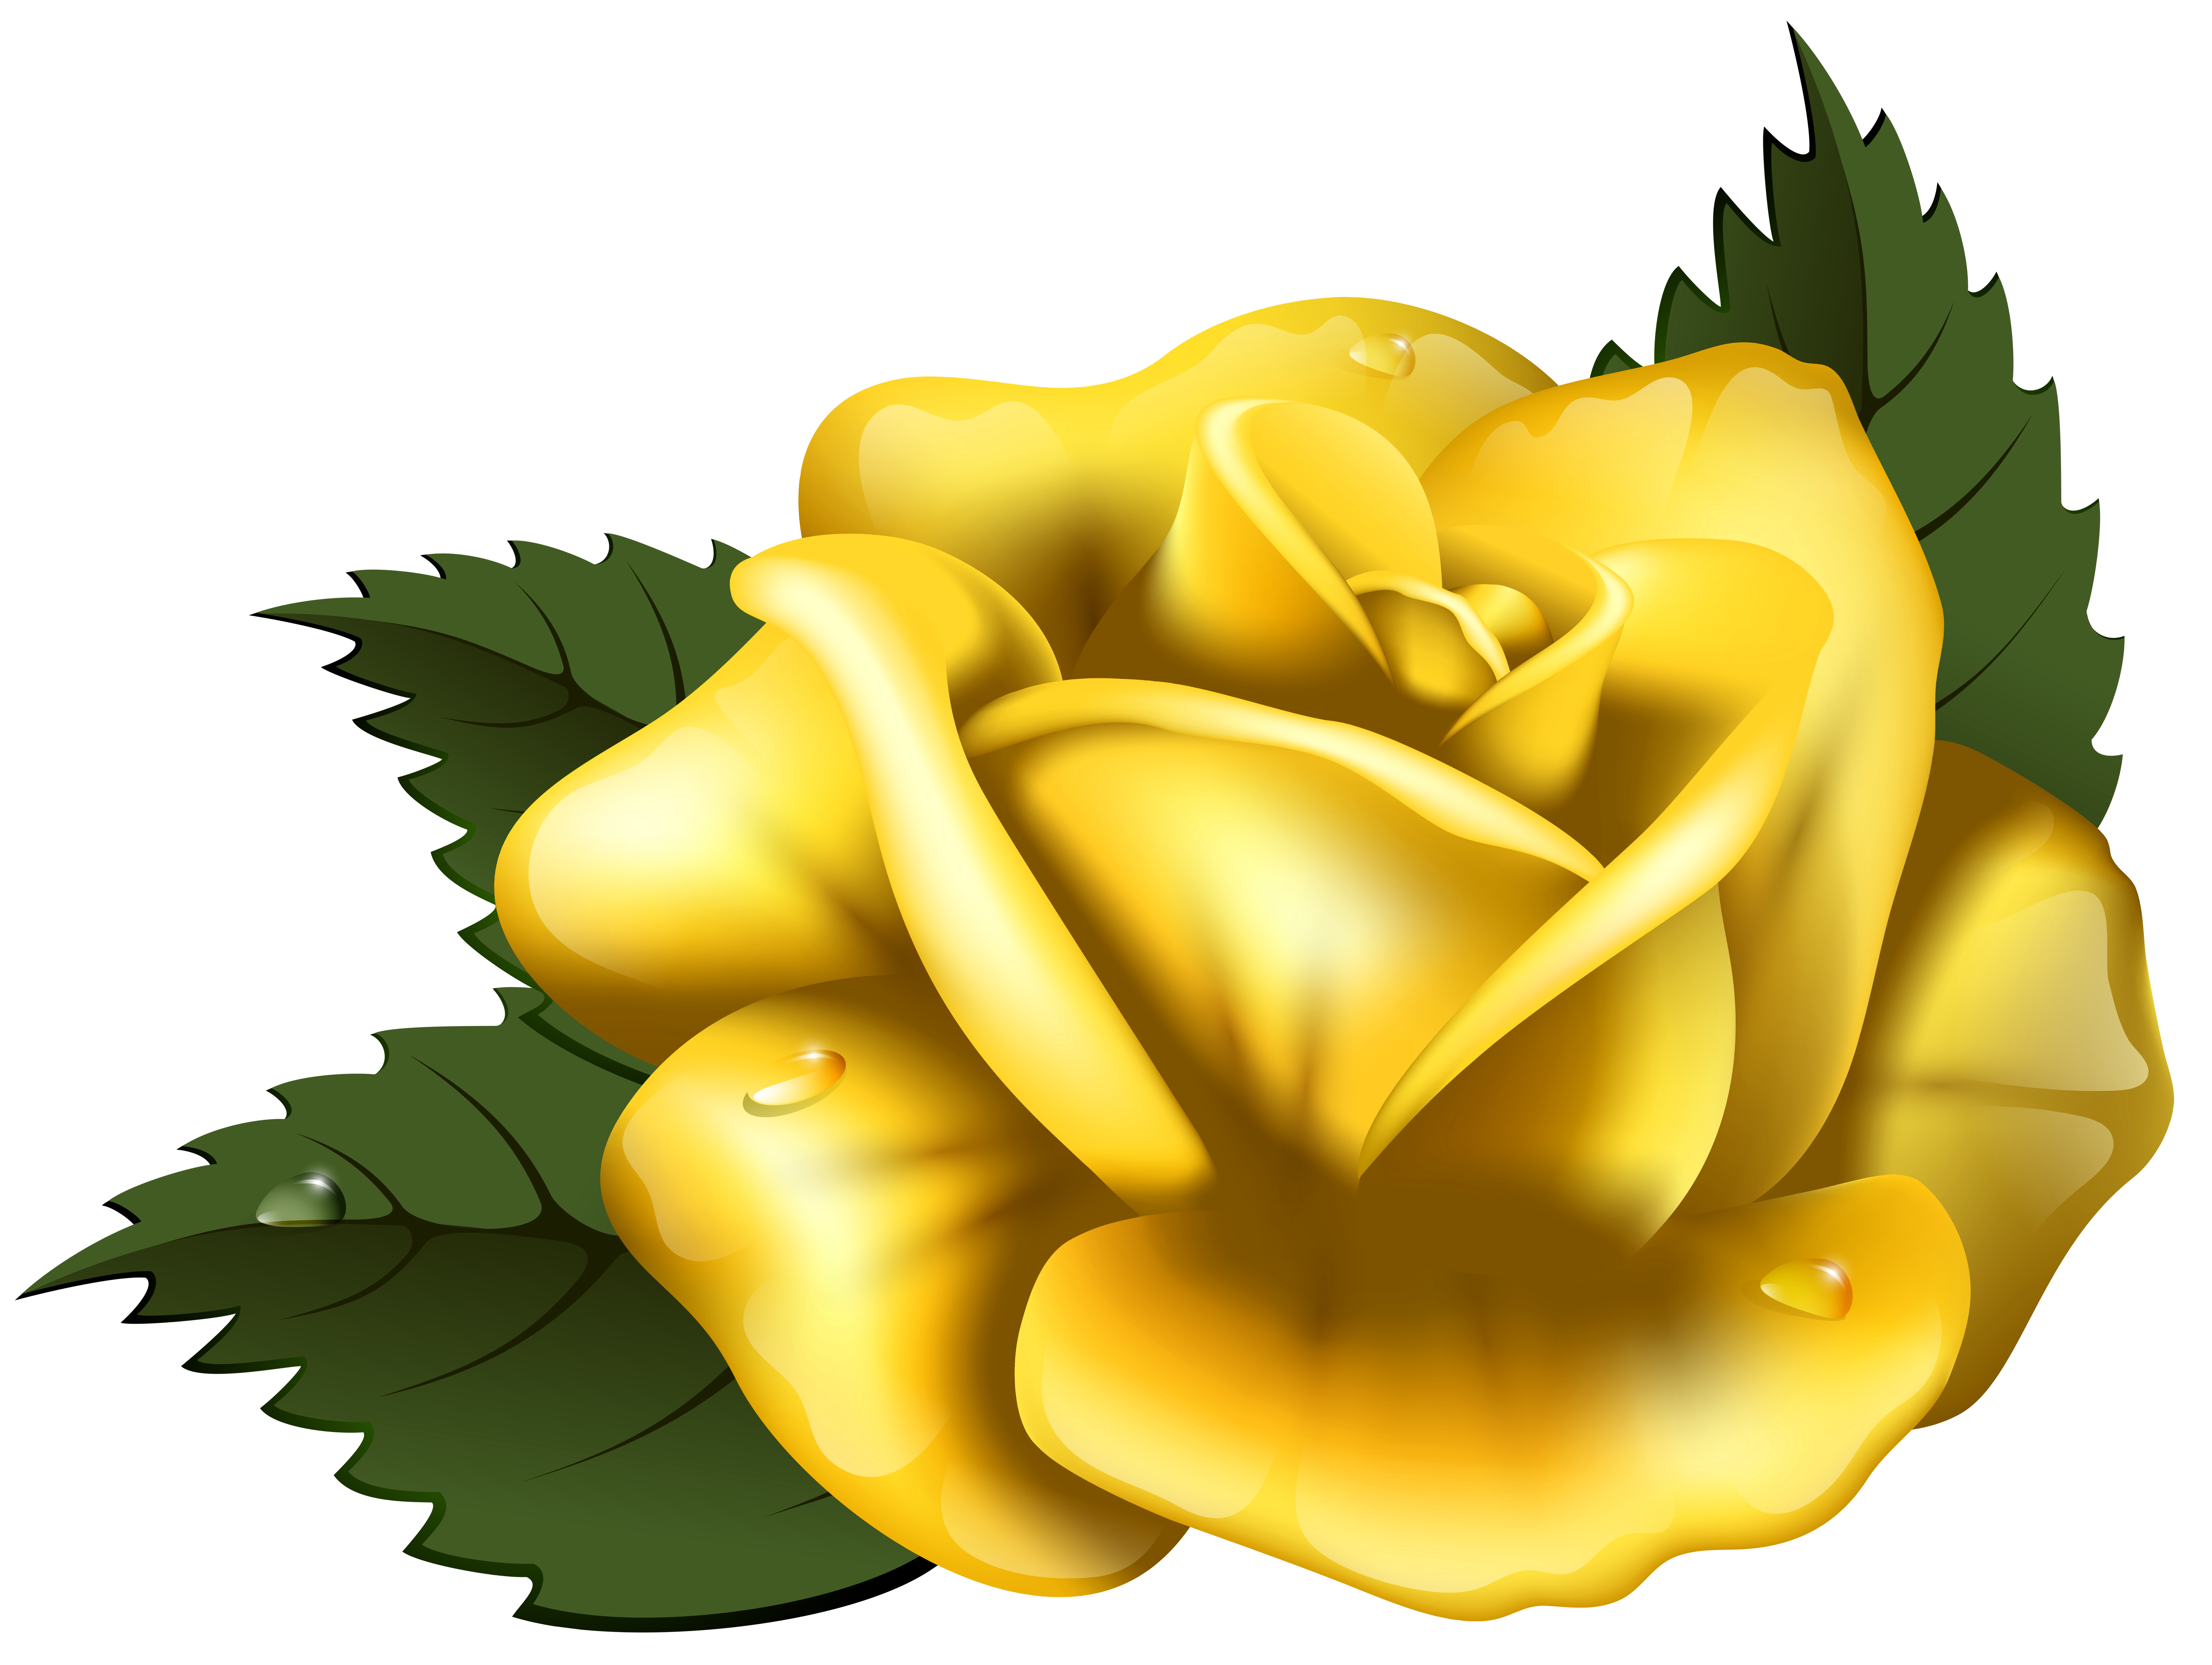 ... Yellow Rose Clip Art U2013 Clipart F-... yellow rose clip art u2013 Clipart Free Download ...-5